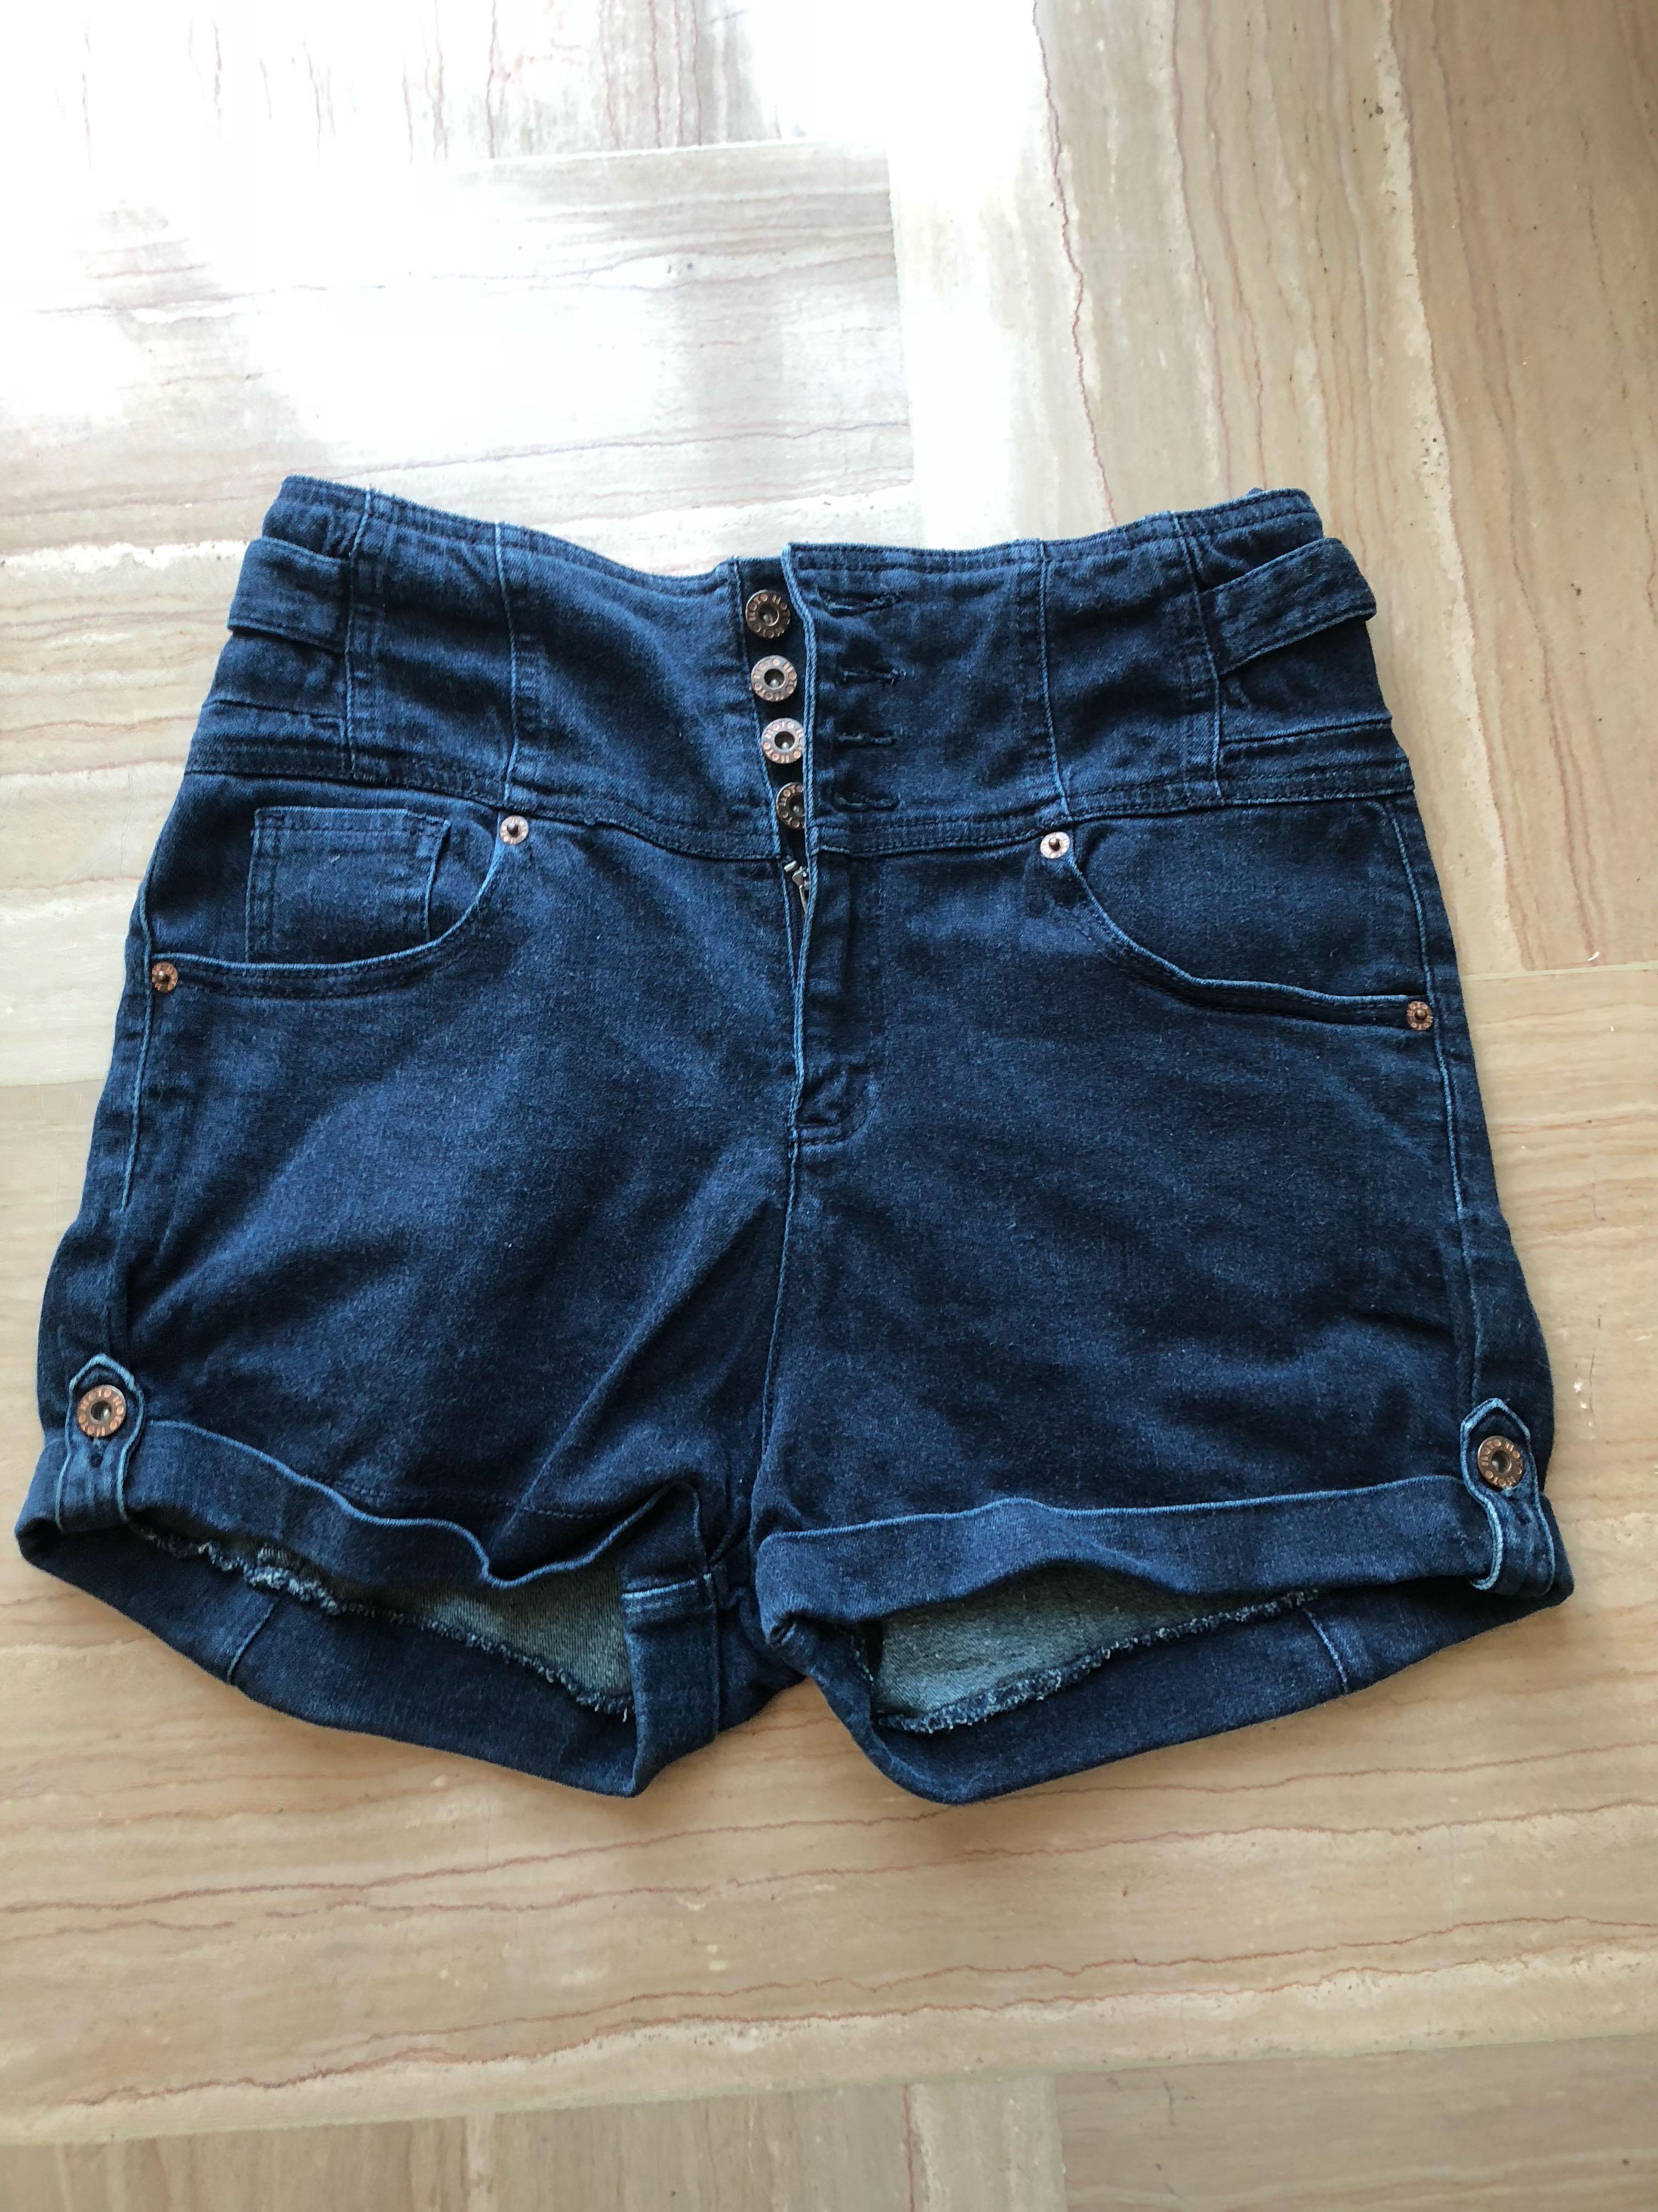 40c11f4e99 Topshop Moto shorts, Women's Fashion, Clothes, Pants, Jeans & Shorts ...